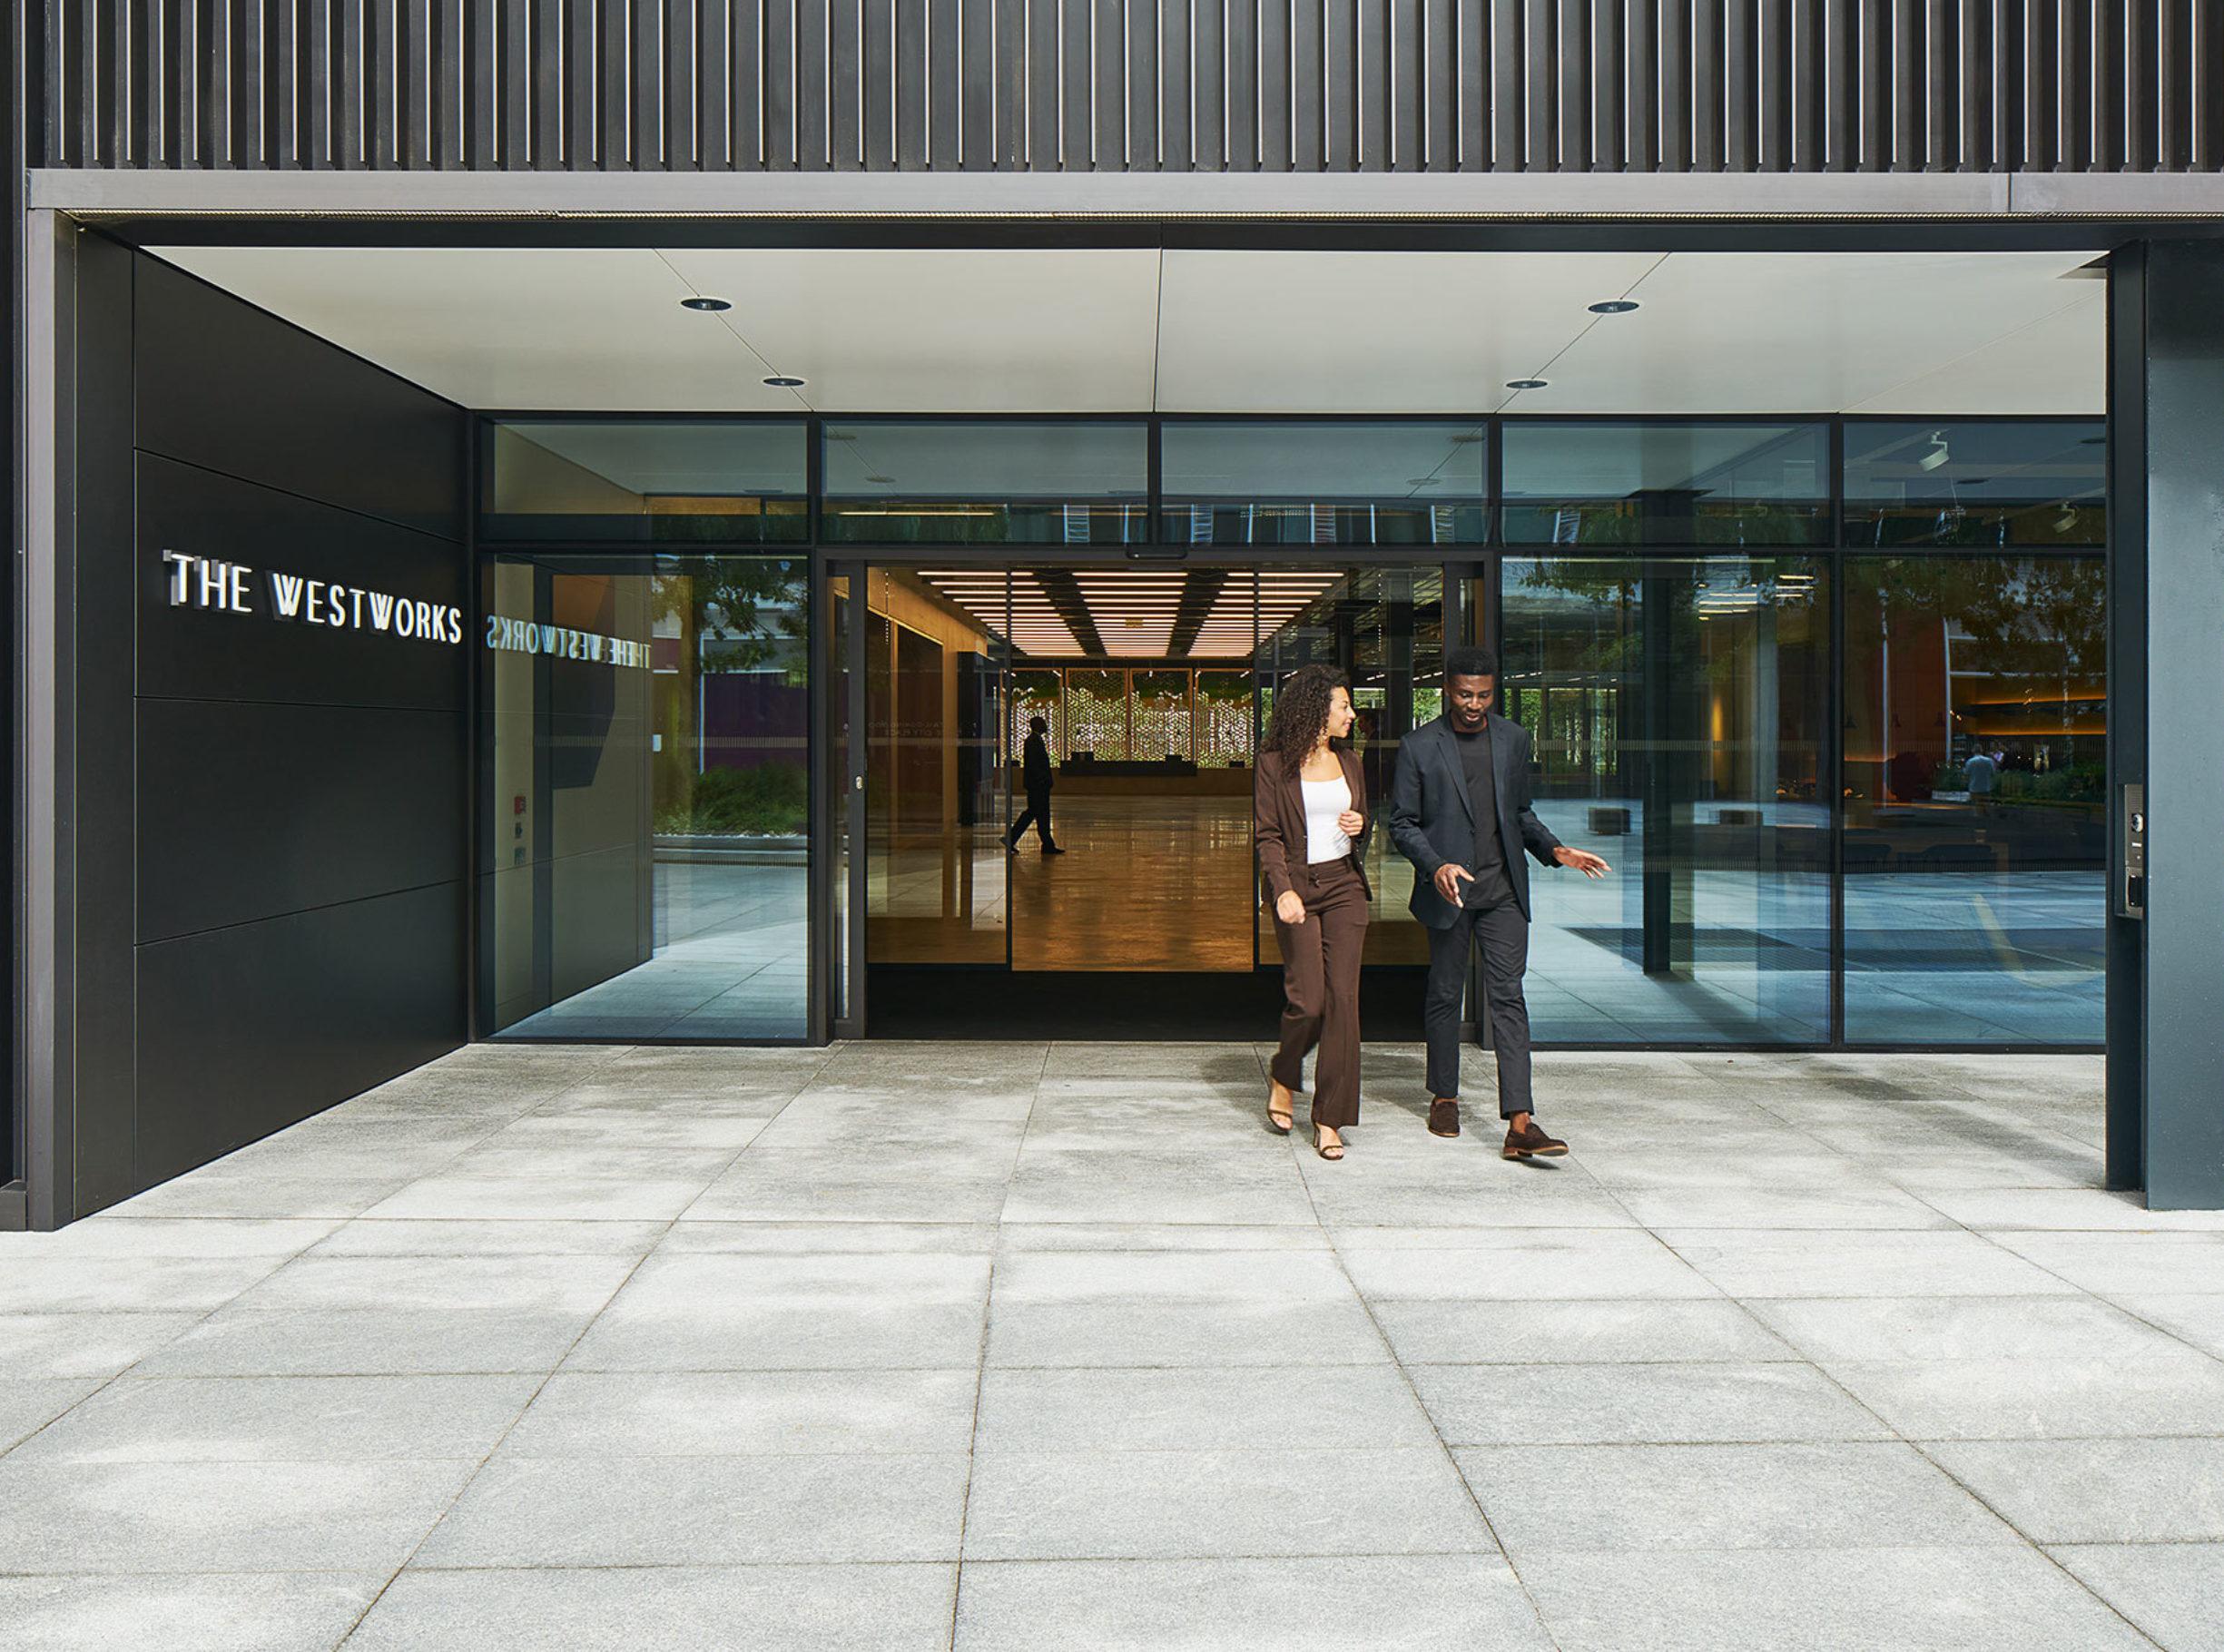 The Ww Entrance